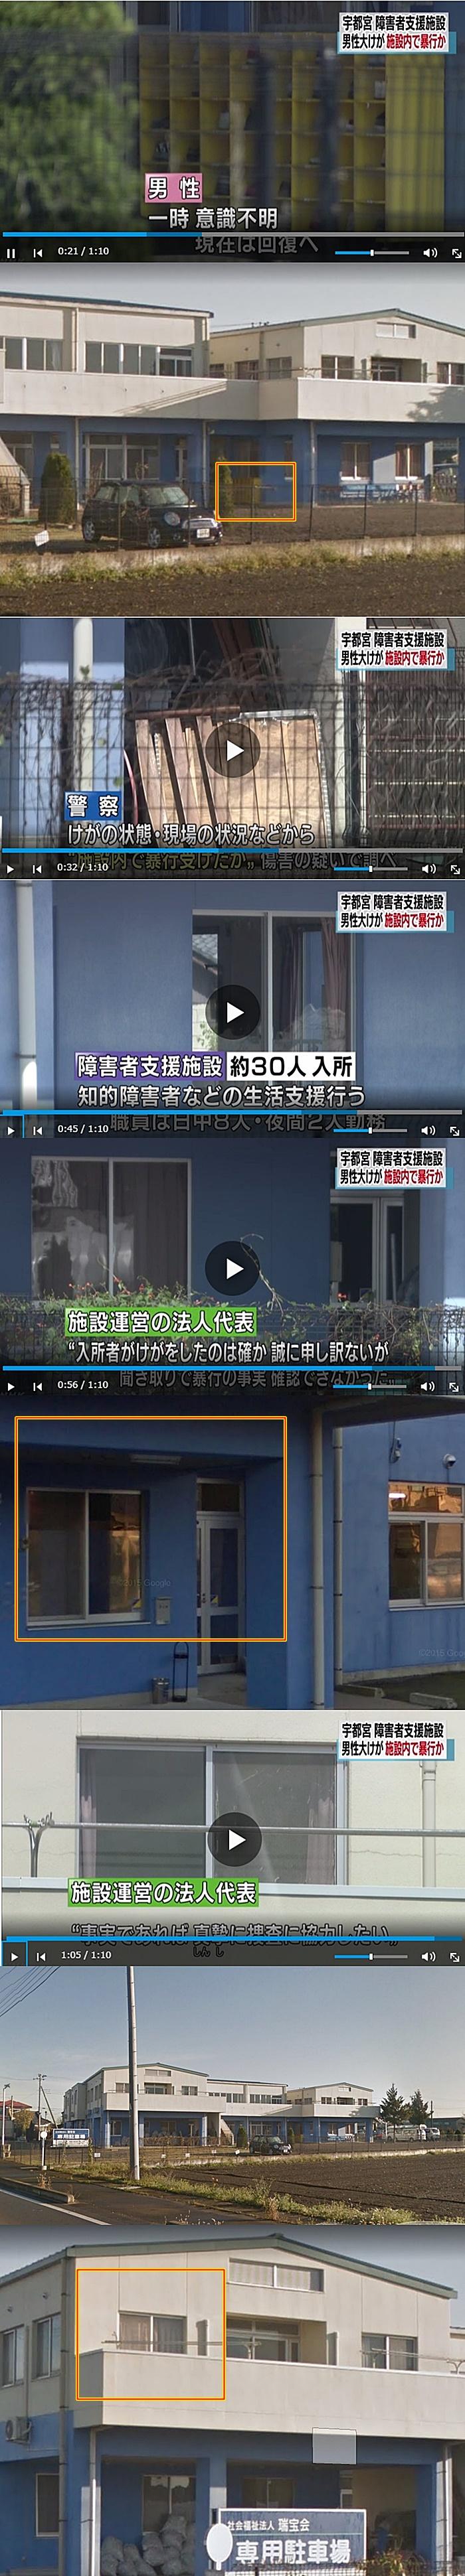 社会福祉法人瑞宝会 土屋和夫理事長 ビ・ブライト 2 (1)